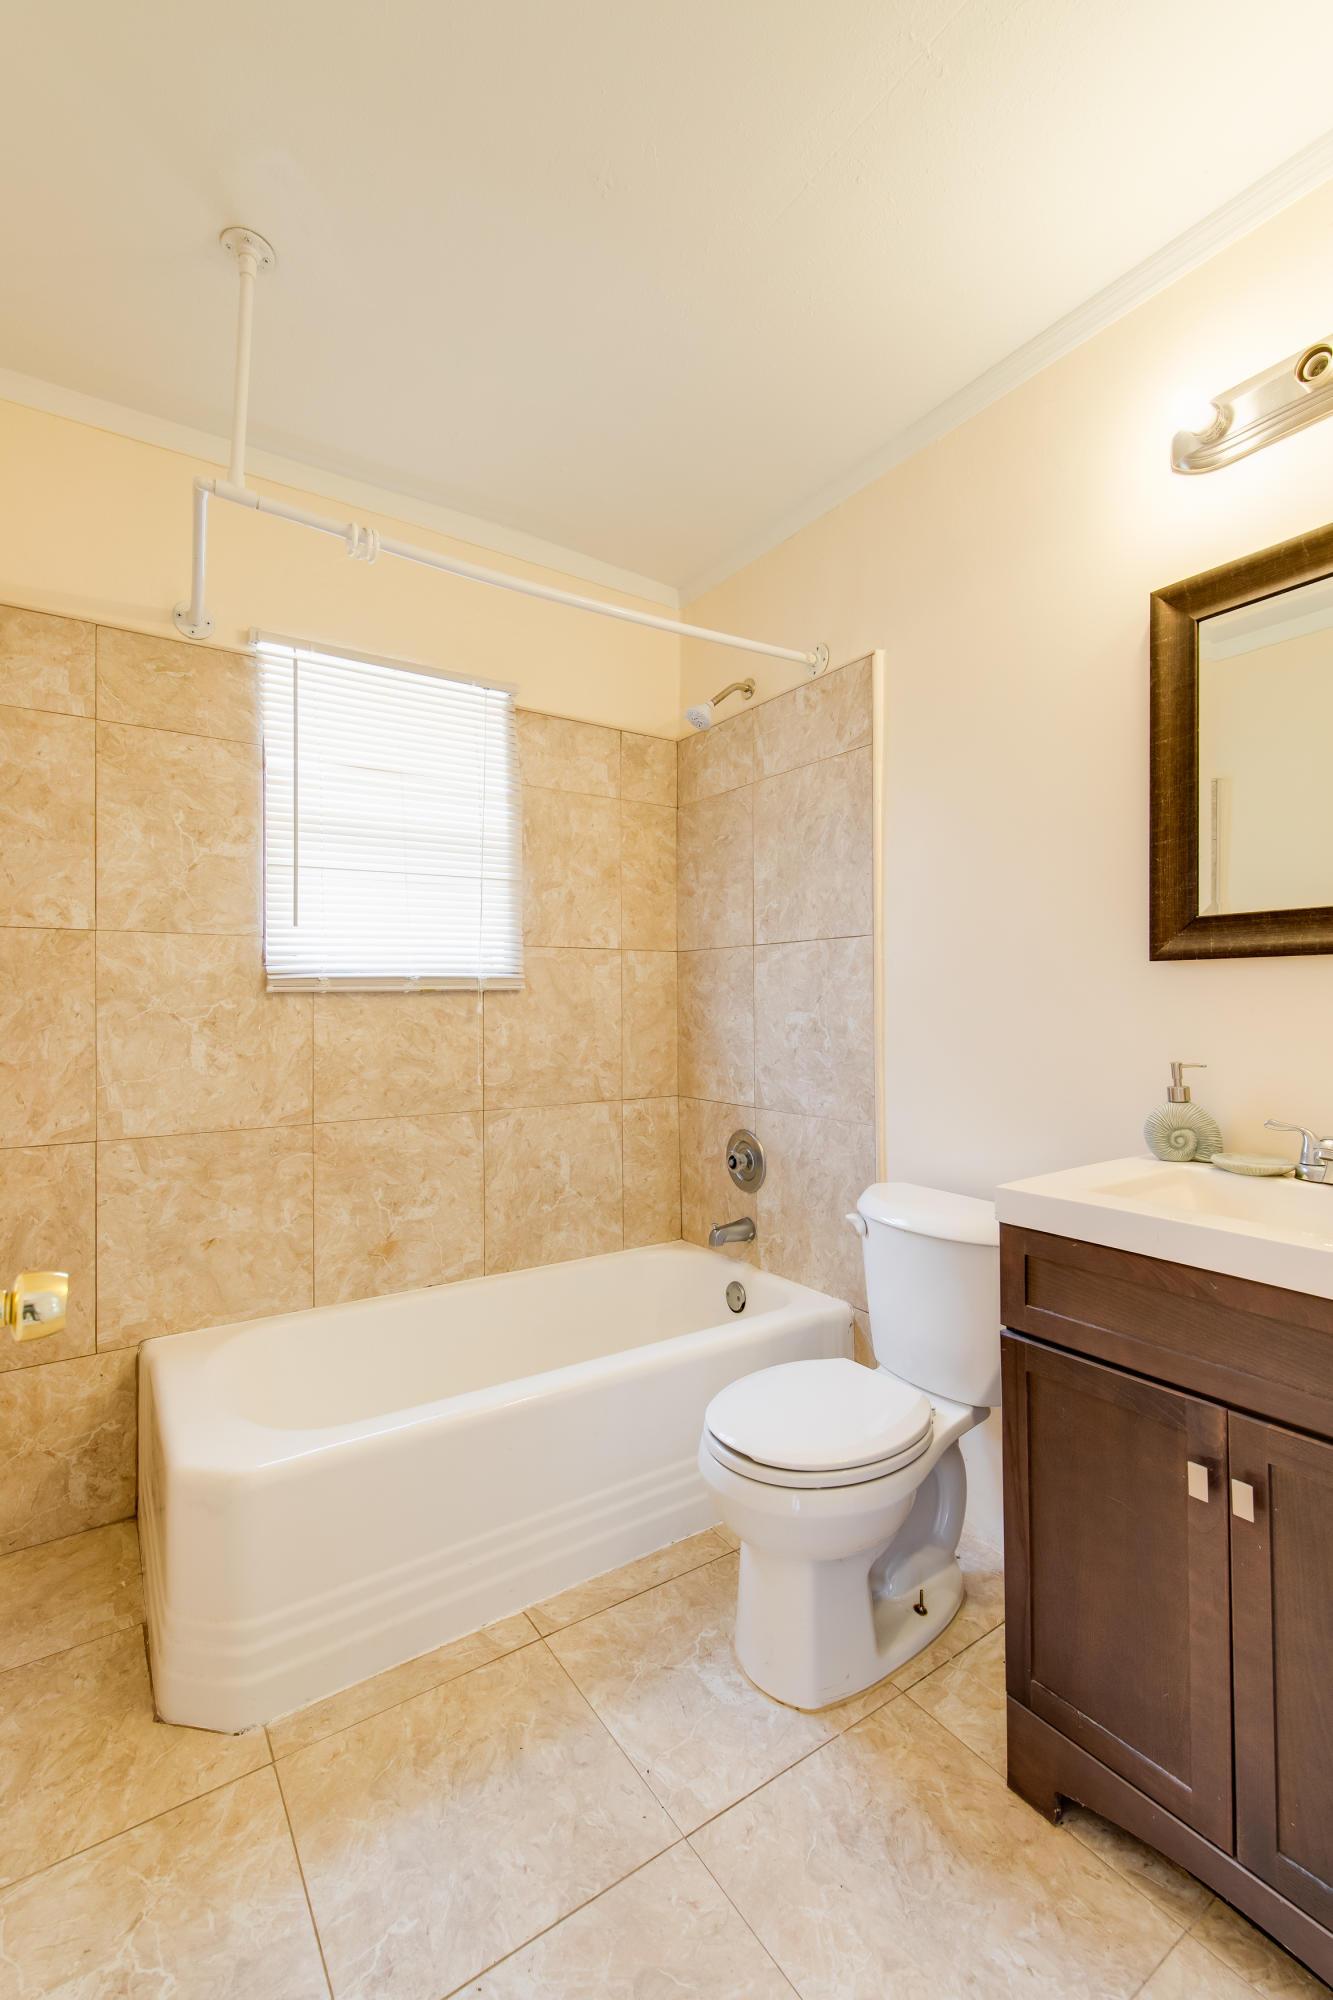 524 55th St Bath Room